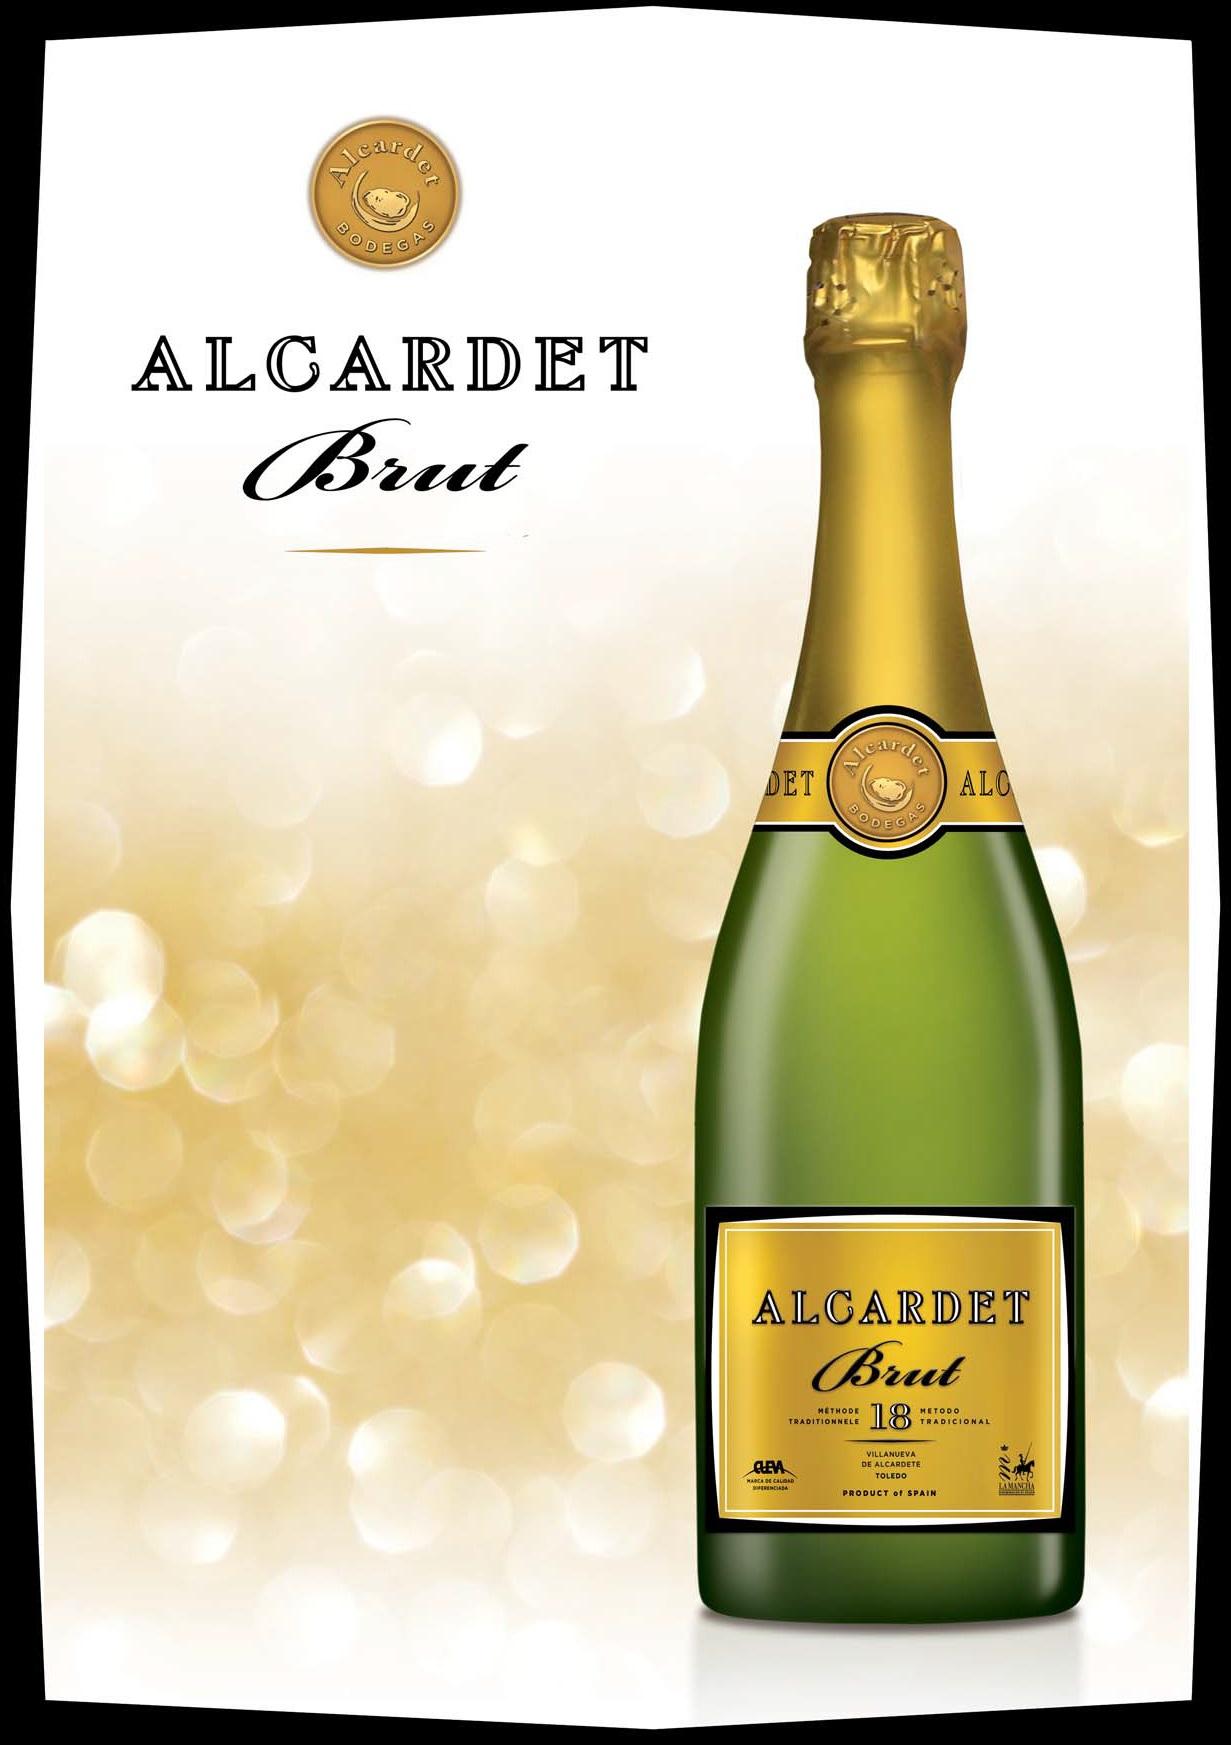 Alcardet Brut 18